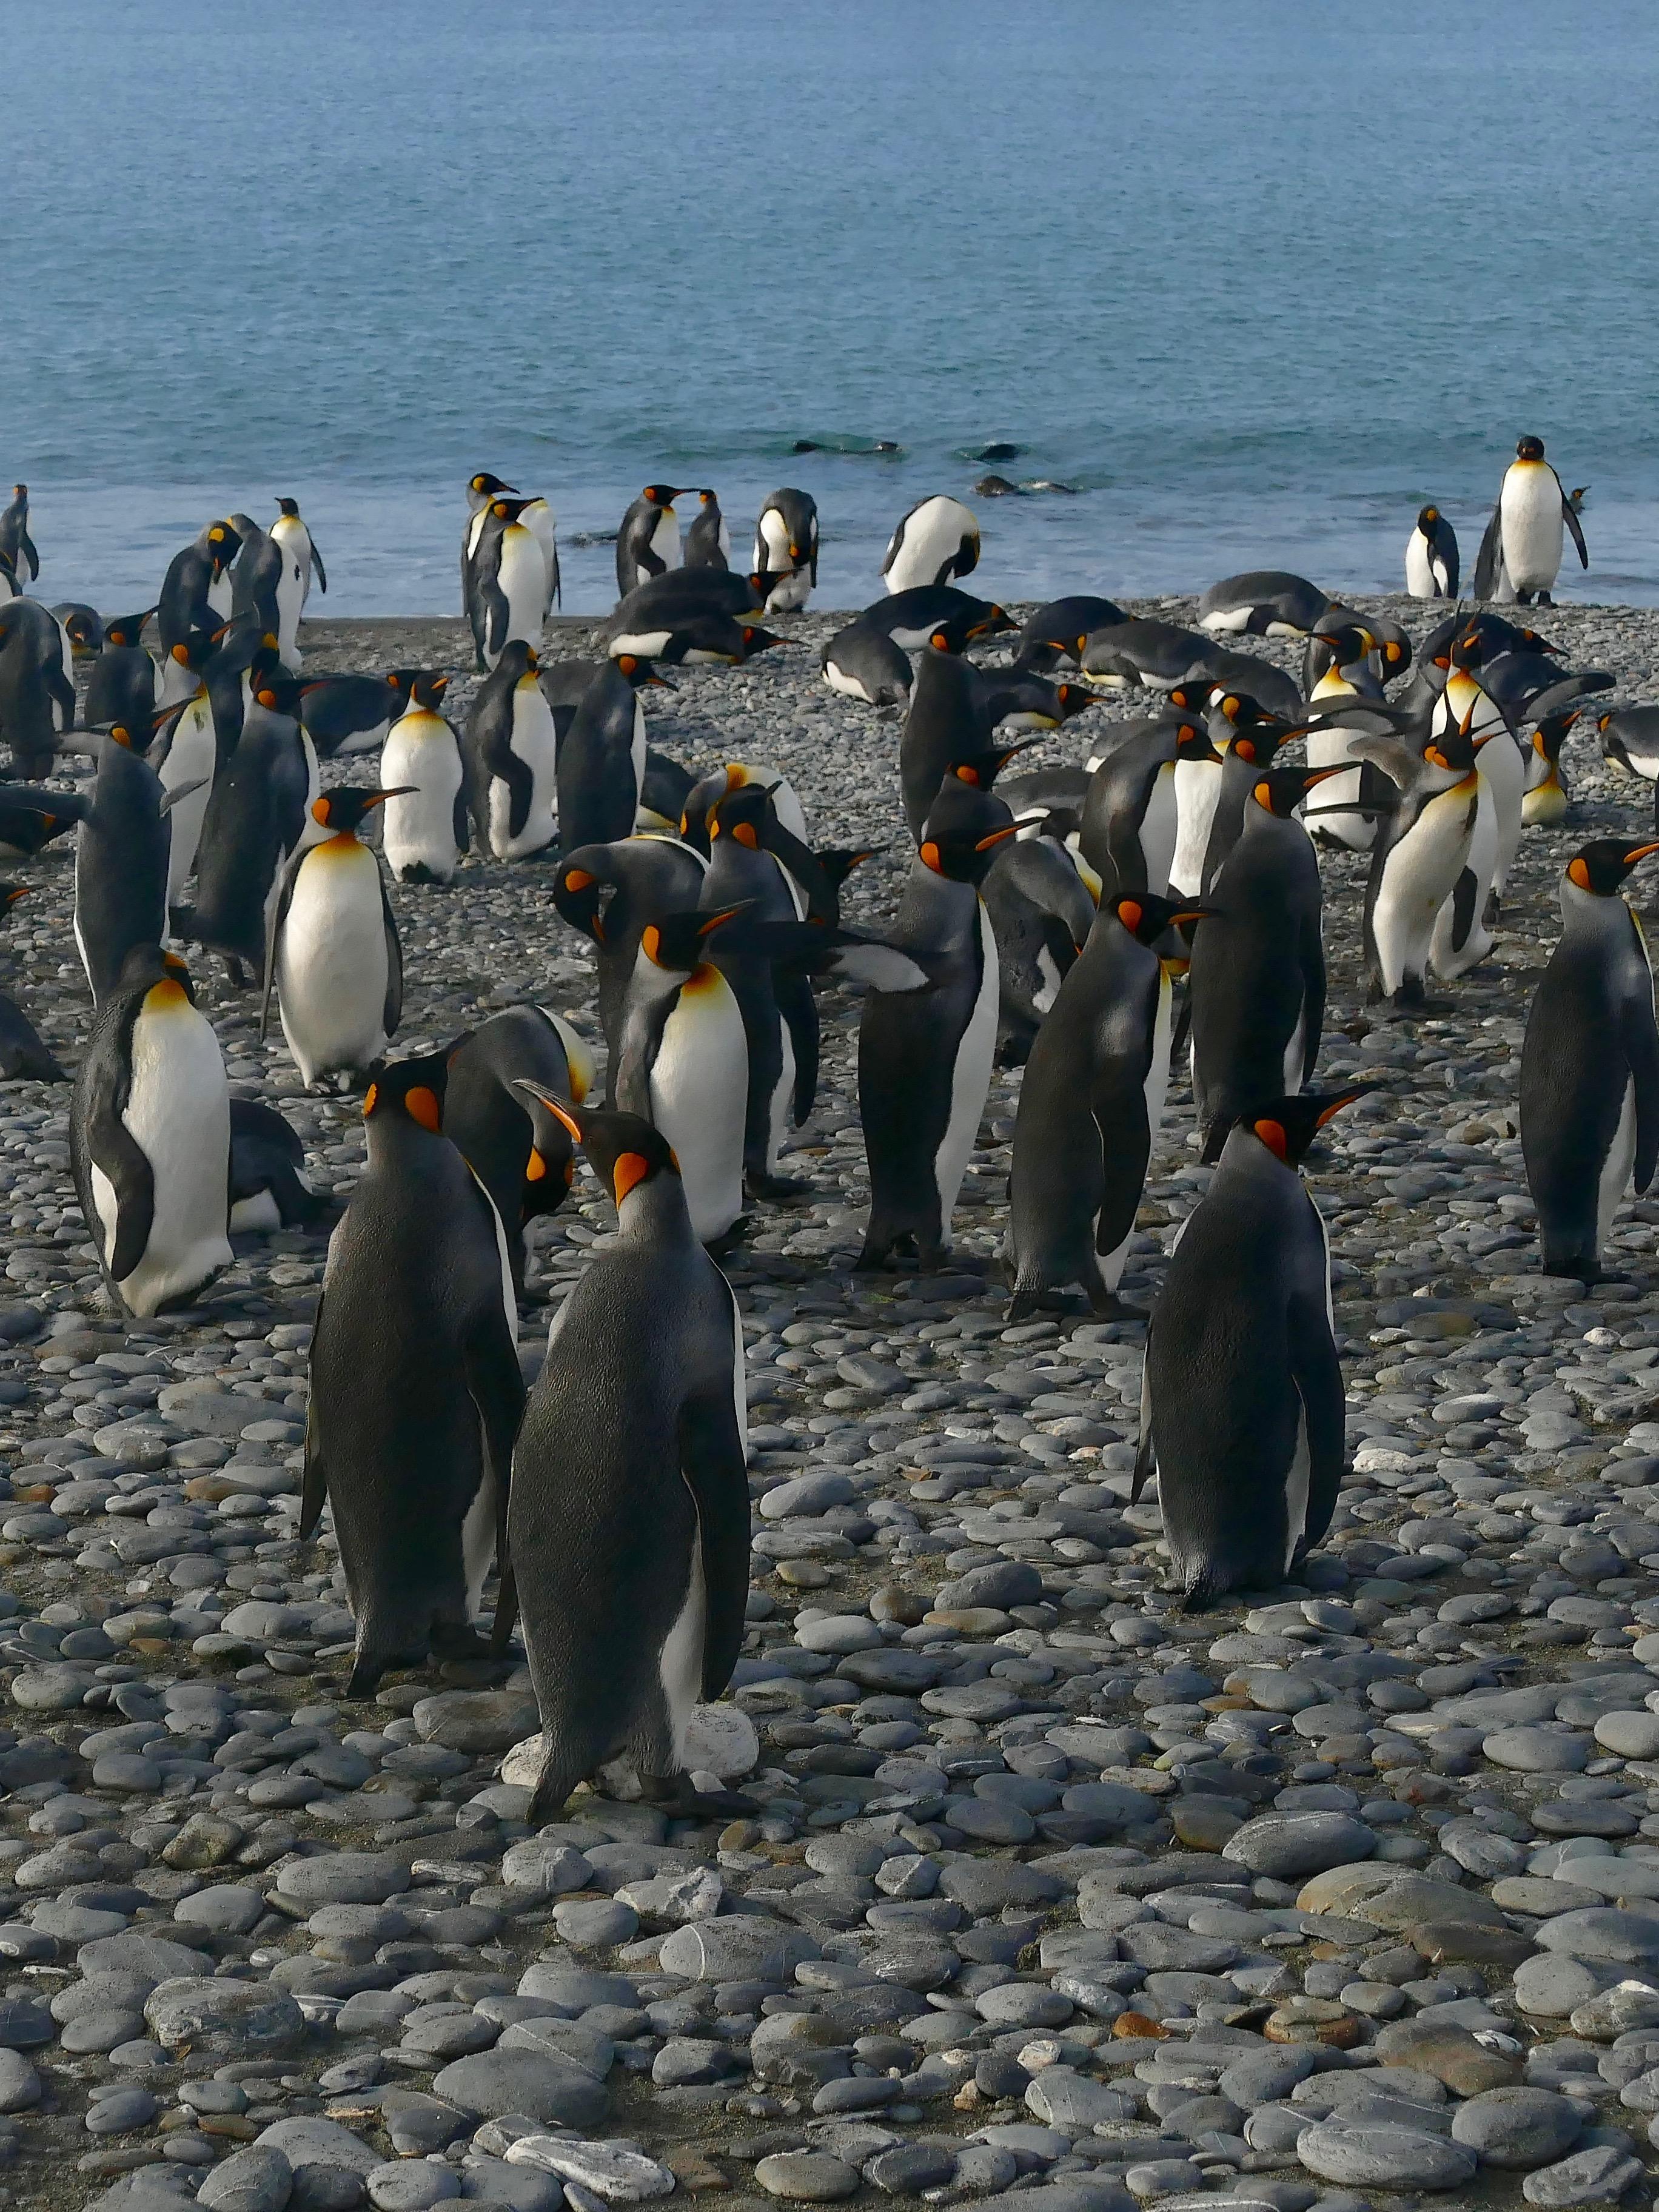 King penguins walking to the sea at Salisbury Plain in South Georgia